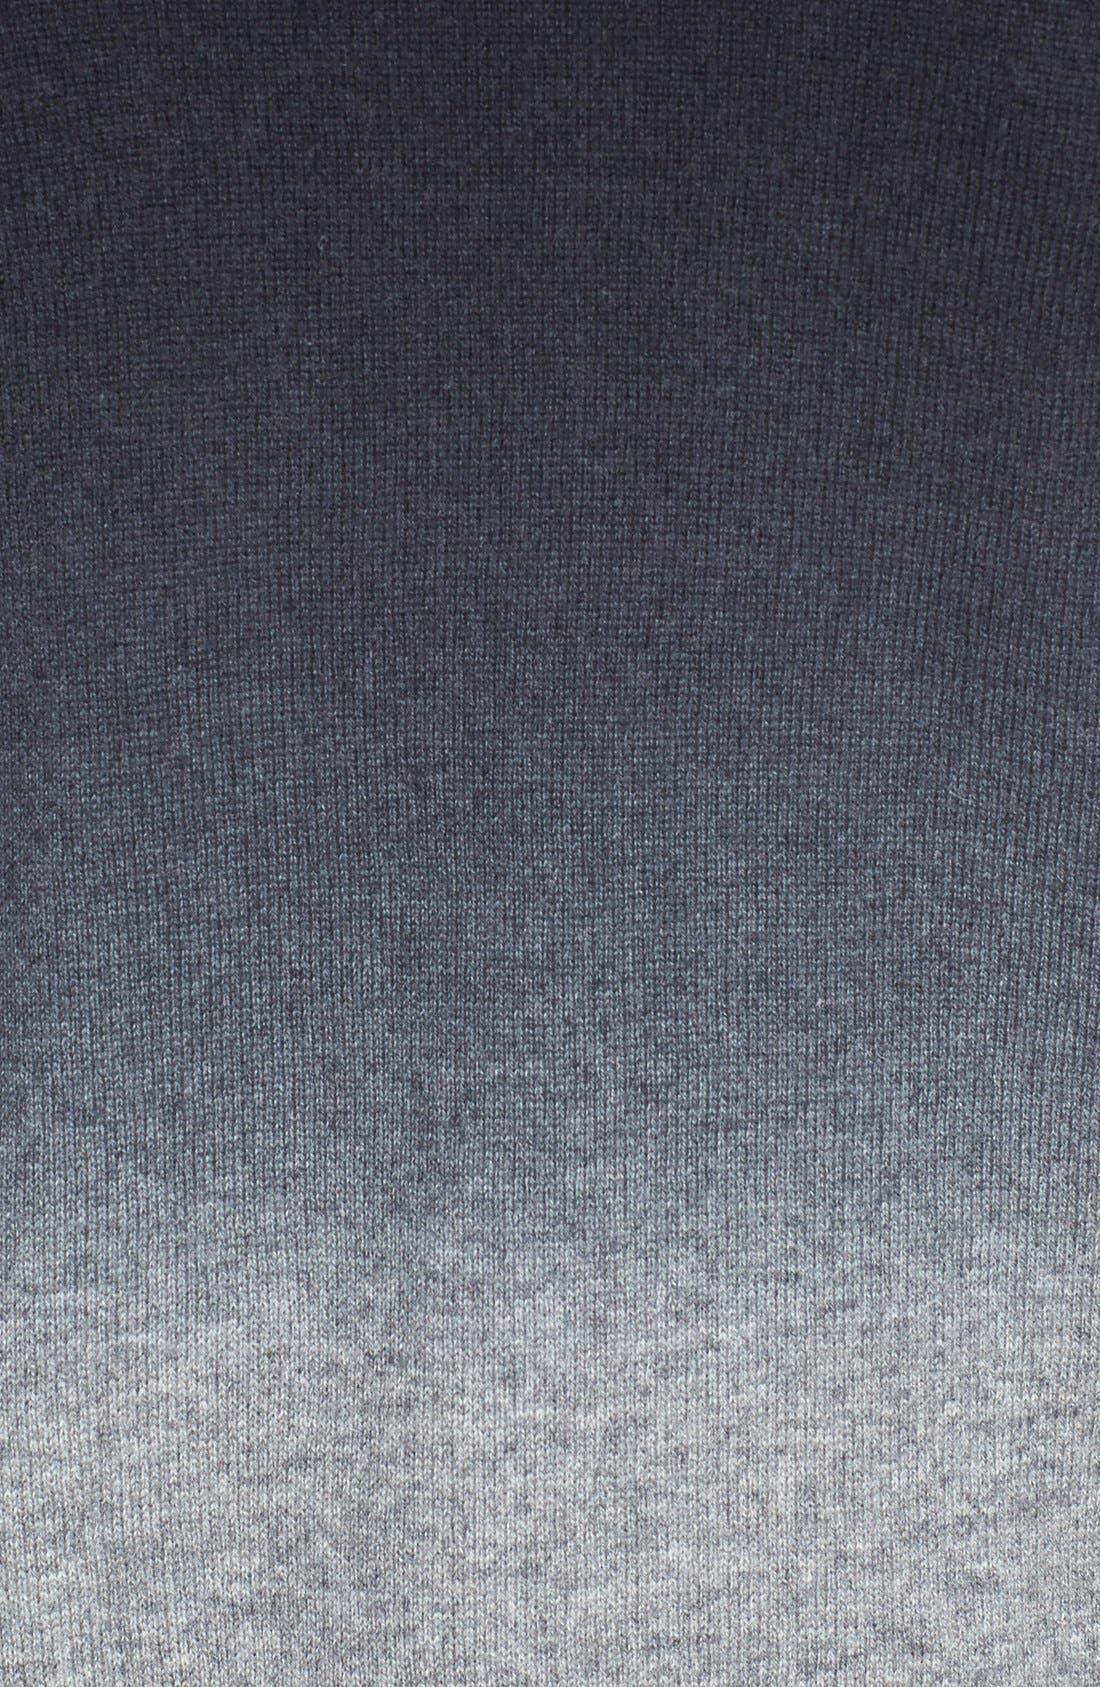 Dip Dye Cardigan,                             Alternate thumbnail 3, color,                             Black Combo